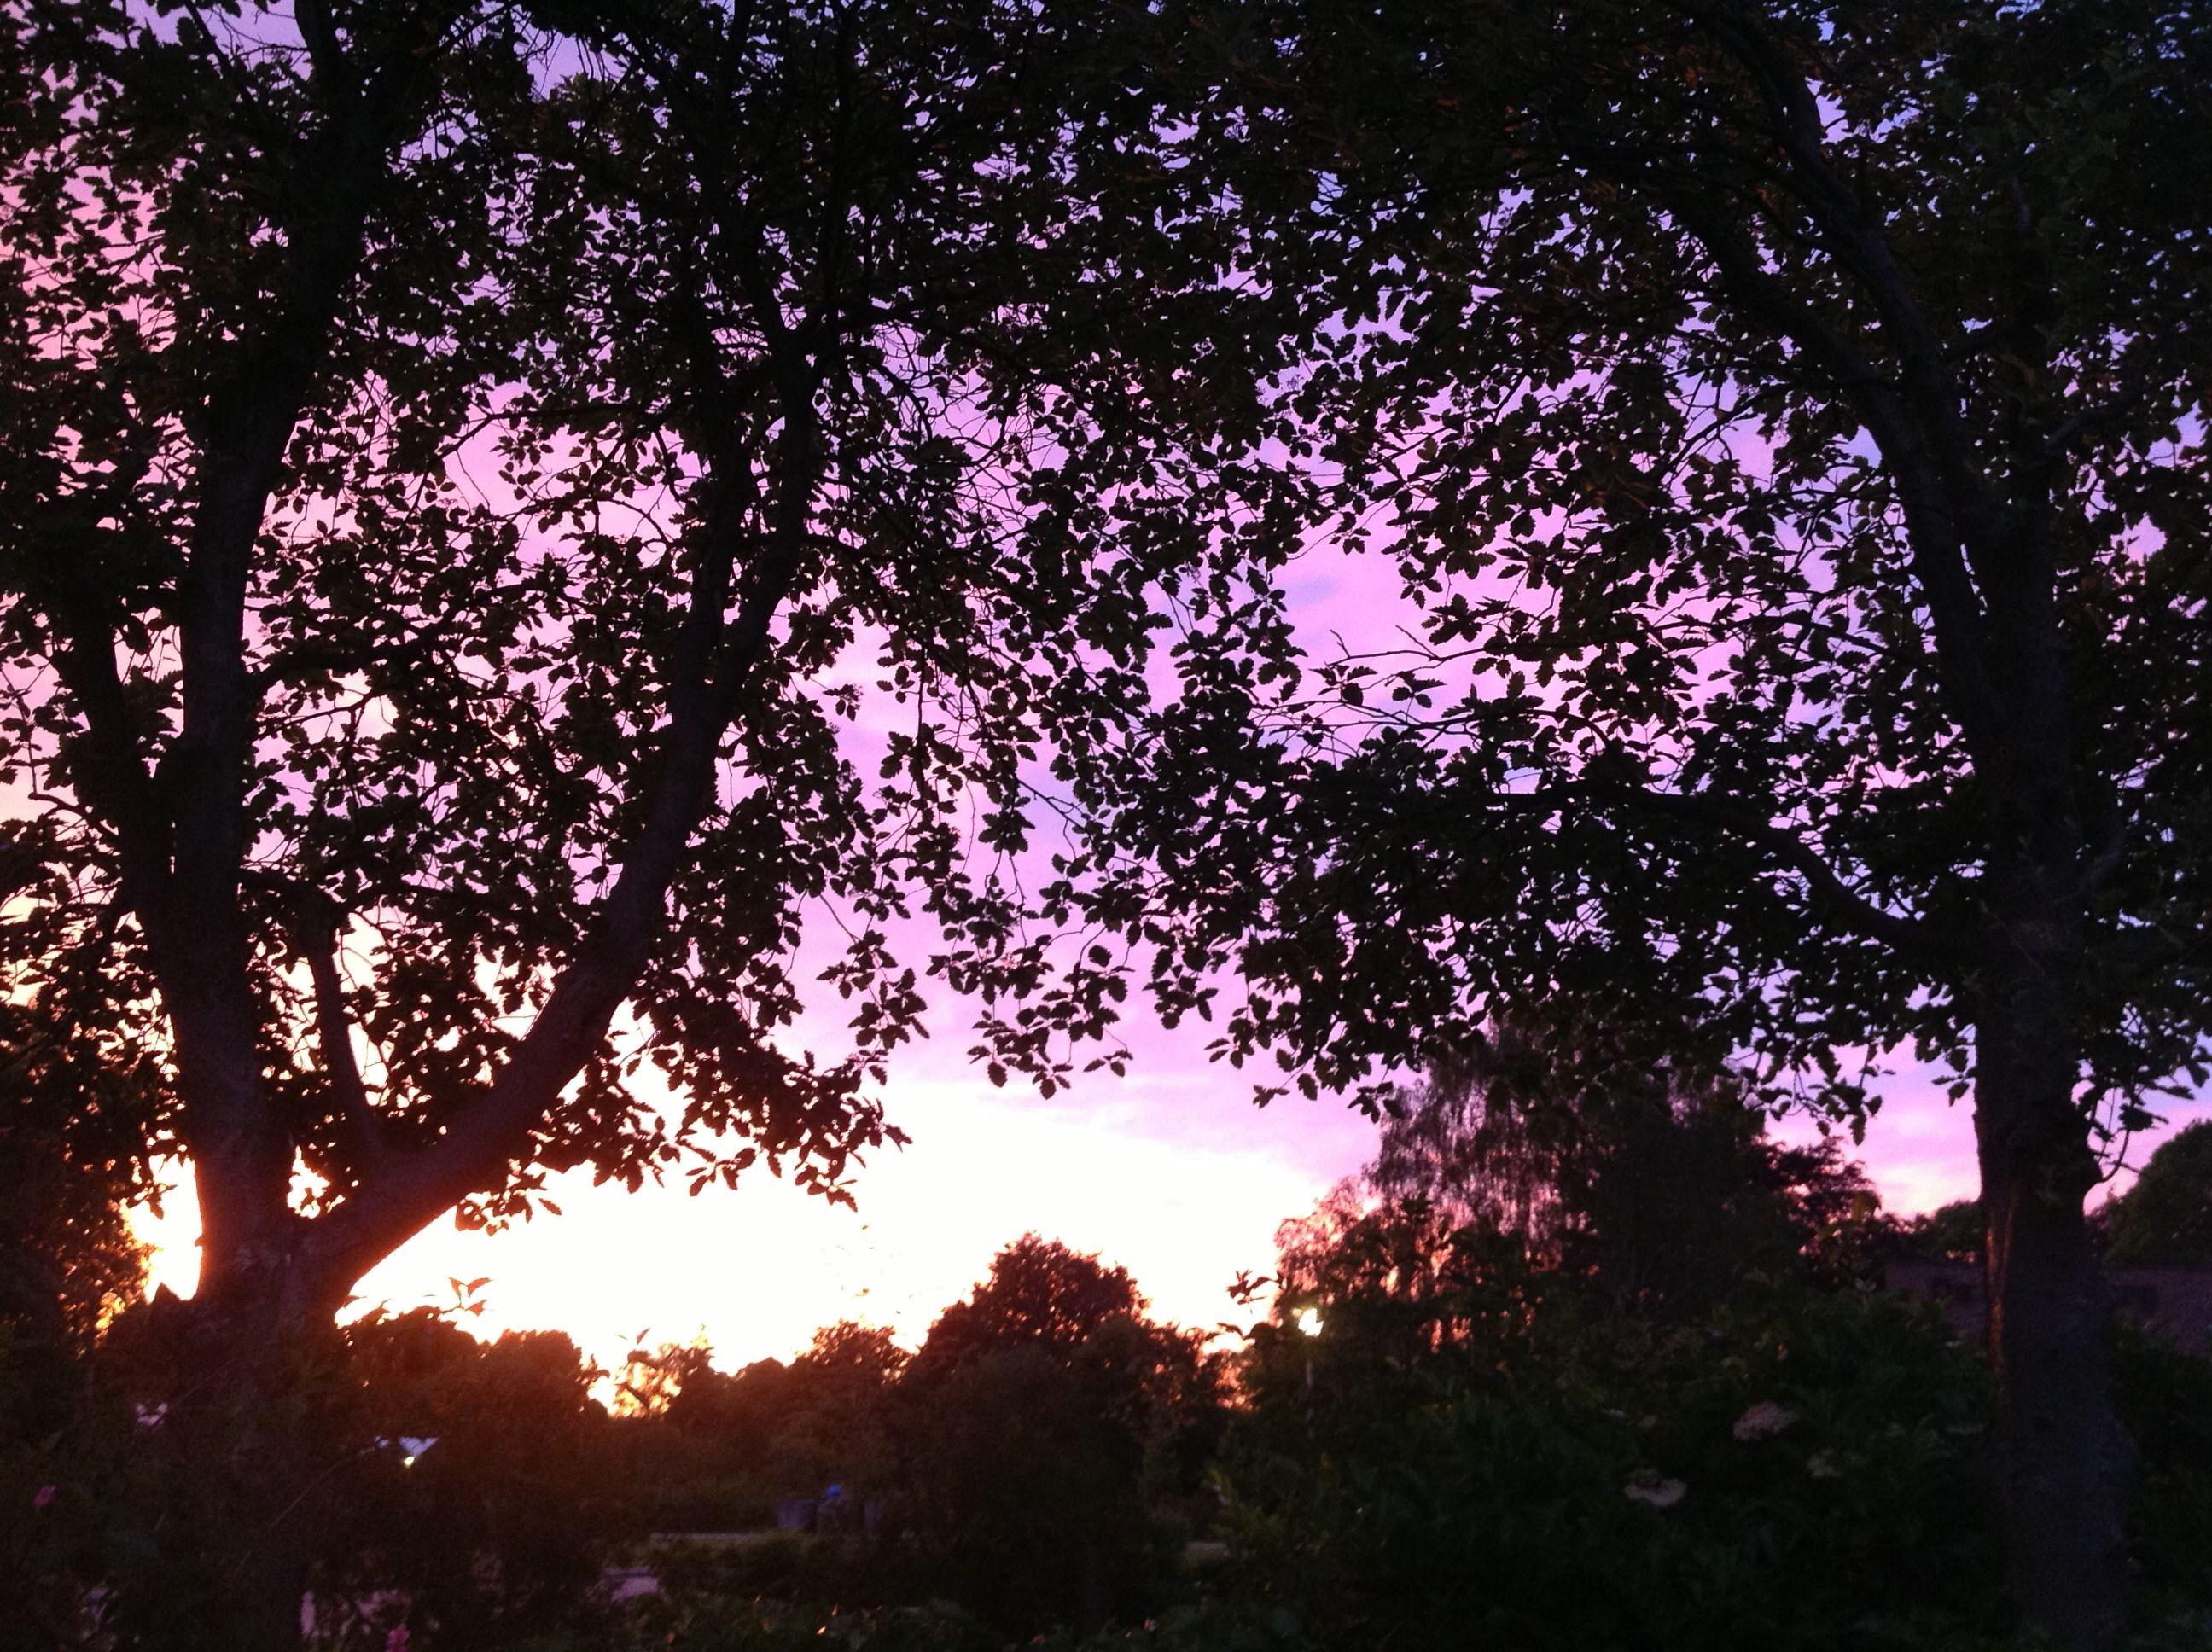 Sunset in my garden